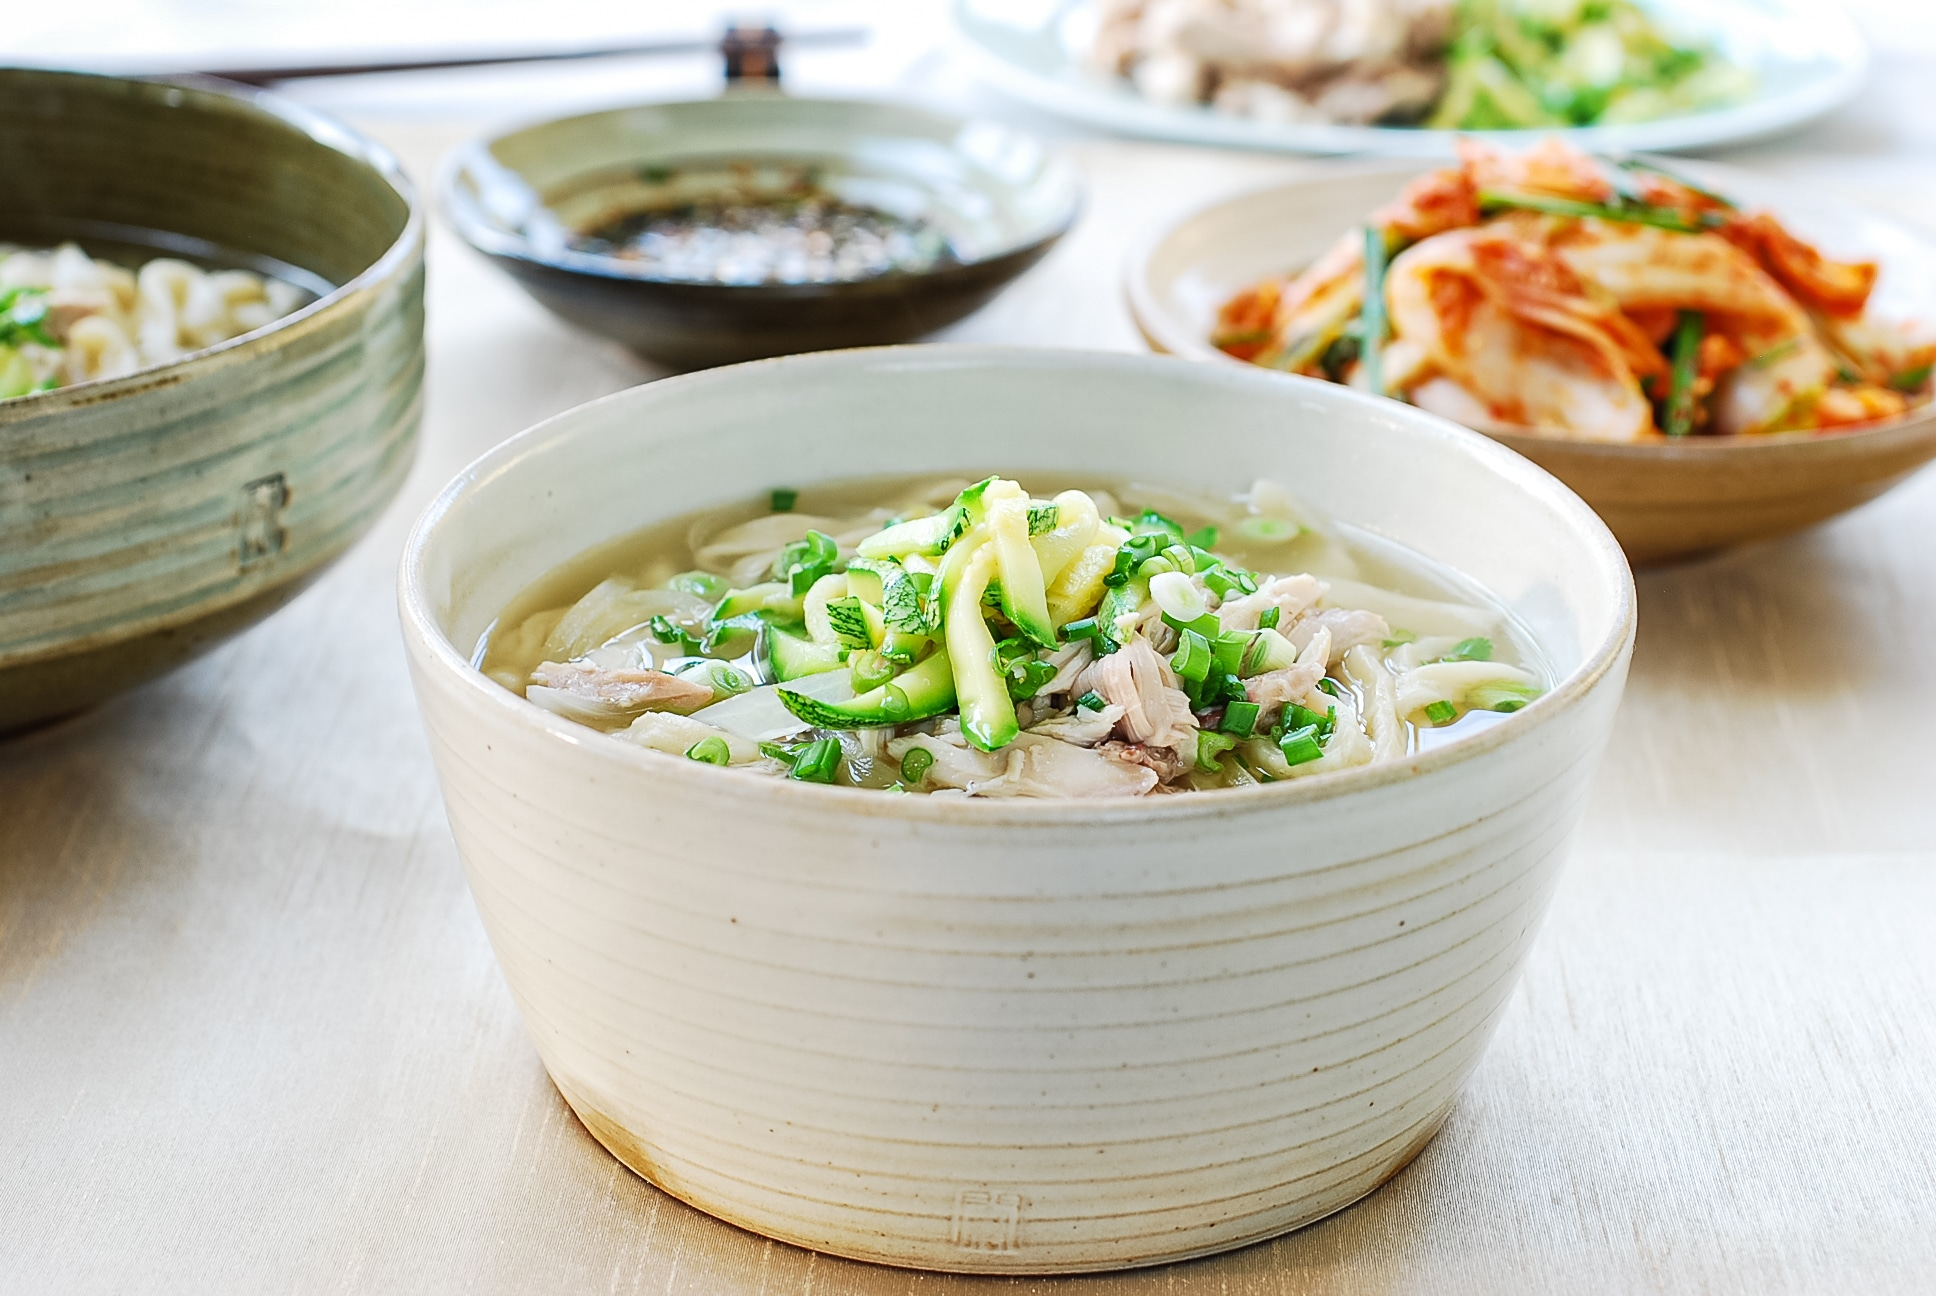 DSC 0963 1 - Dak Kalguksu (Chicken Noodle Soup)